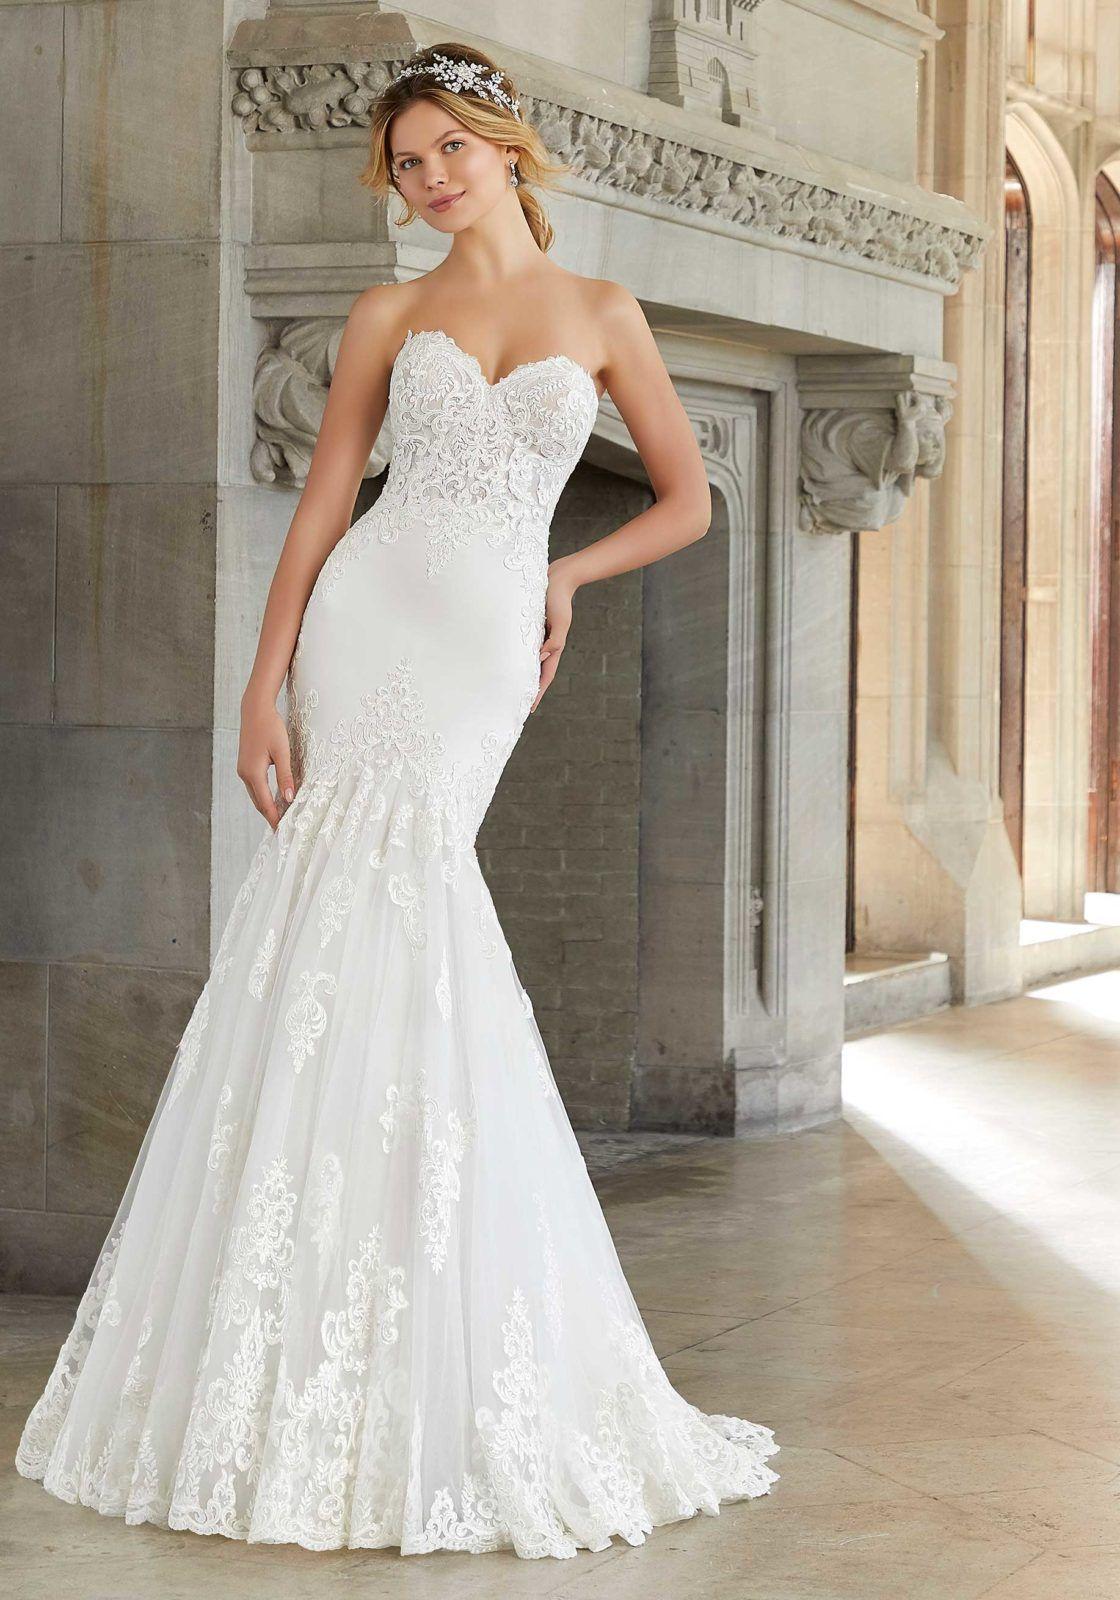 Sonia Wedding Dress Morilee In 2020 Wedding Gowns Mermaid Designer Wedding Dresses Tulle Wedding Dress